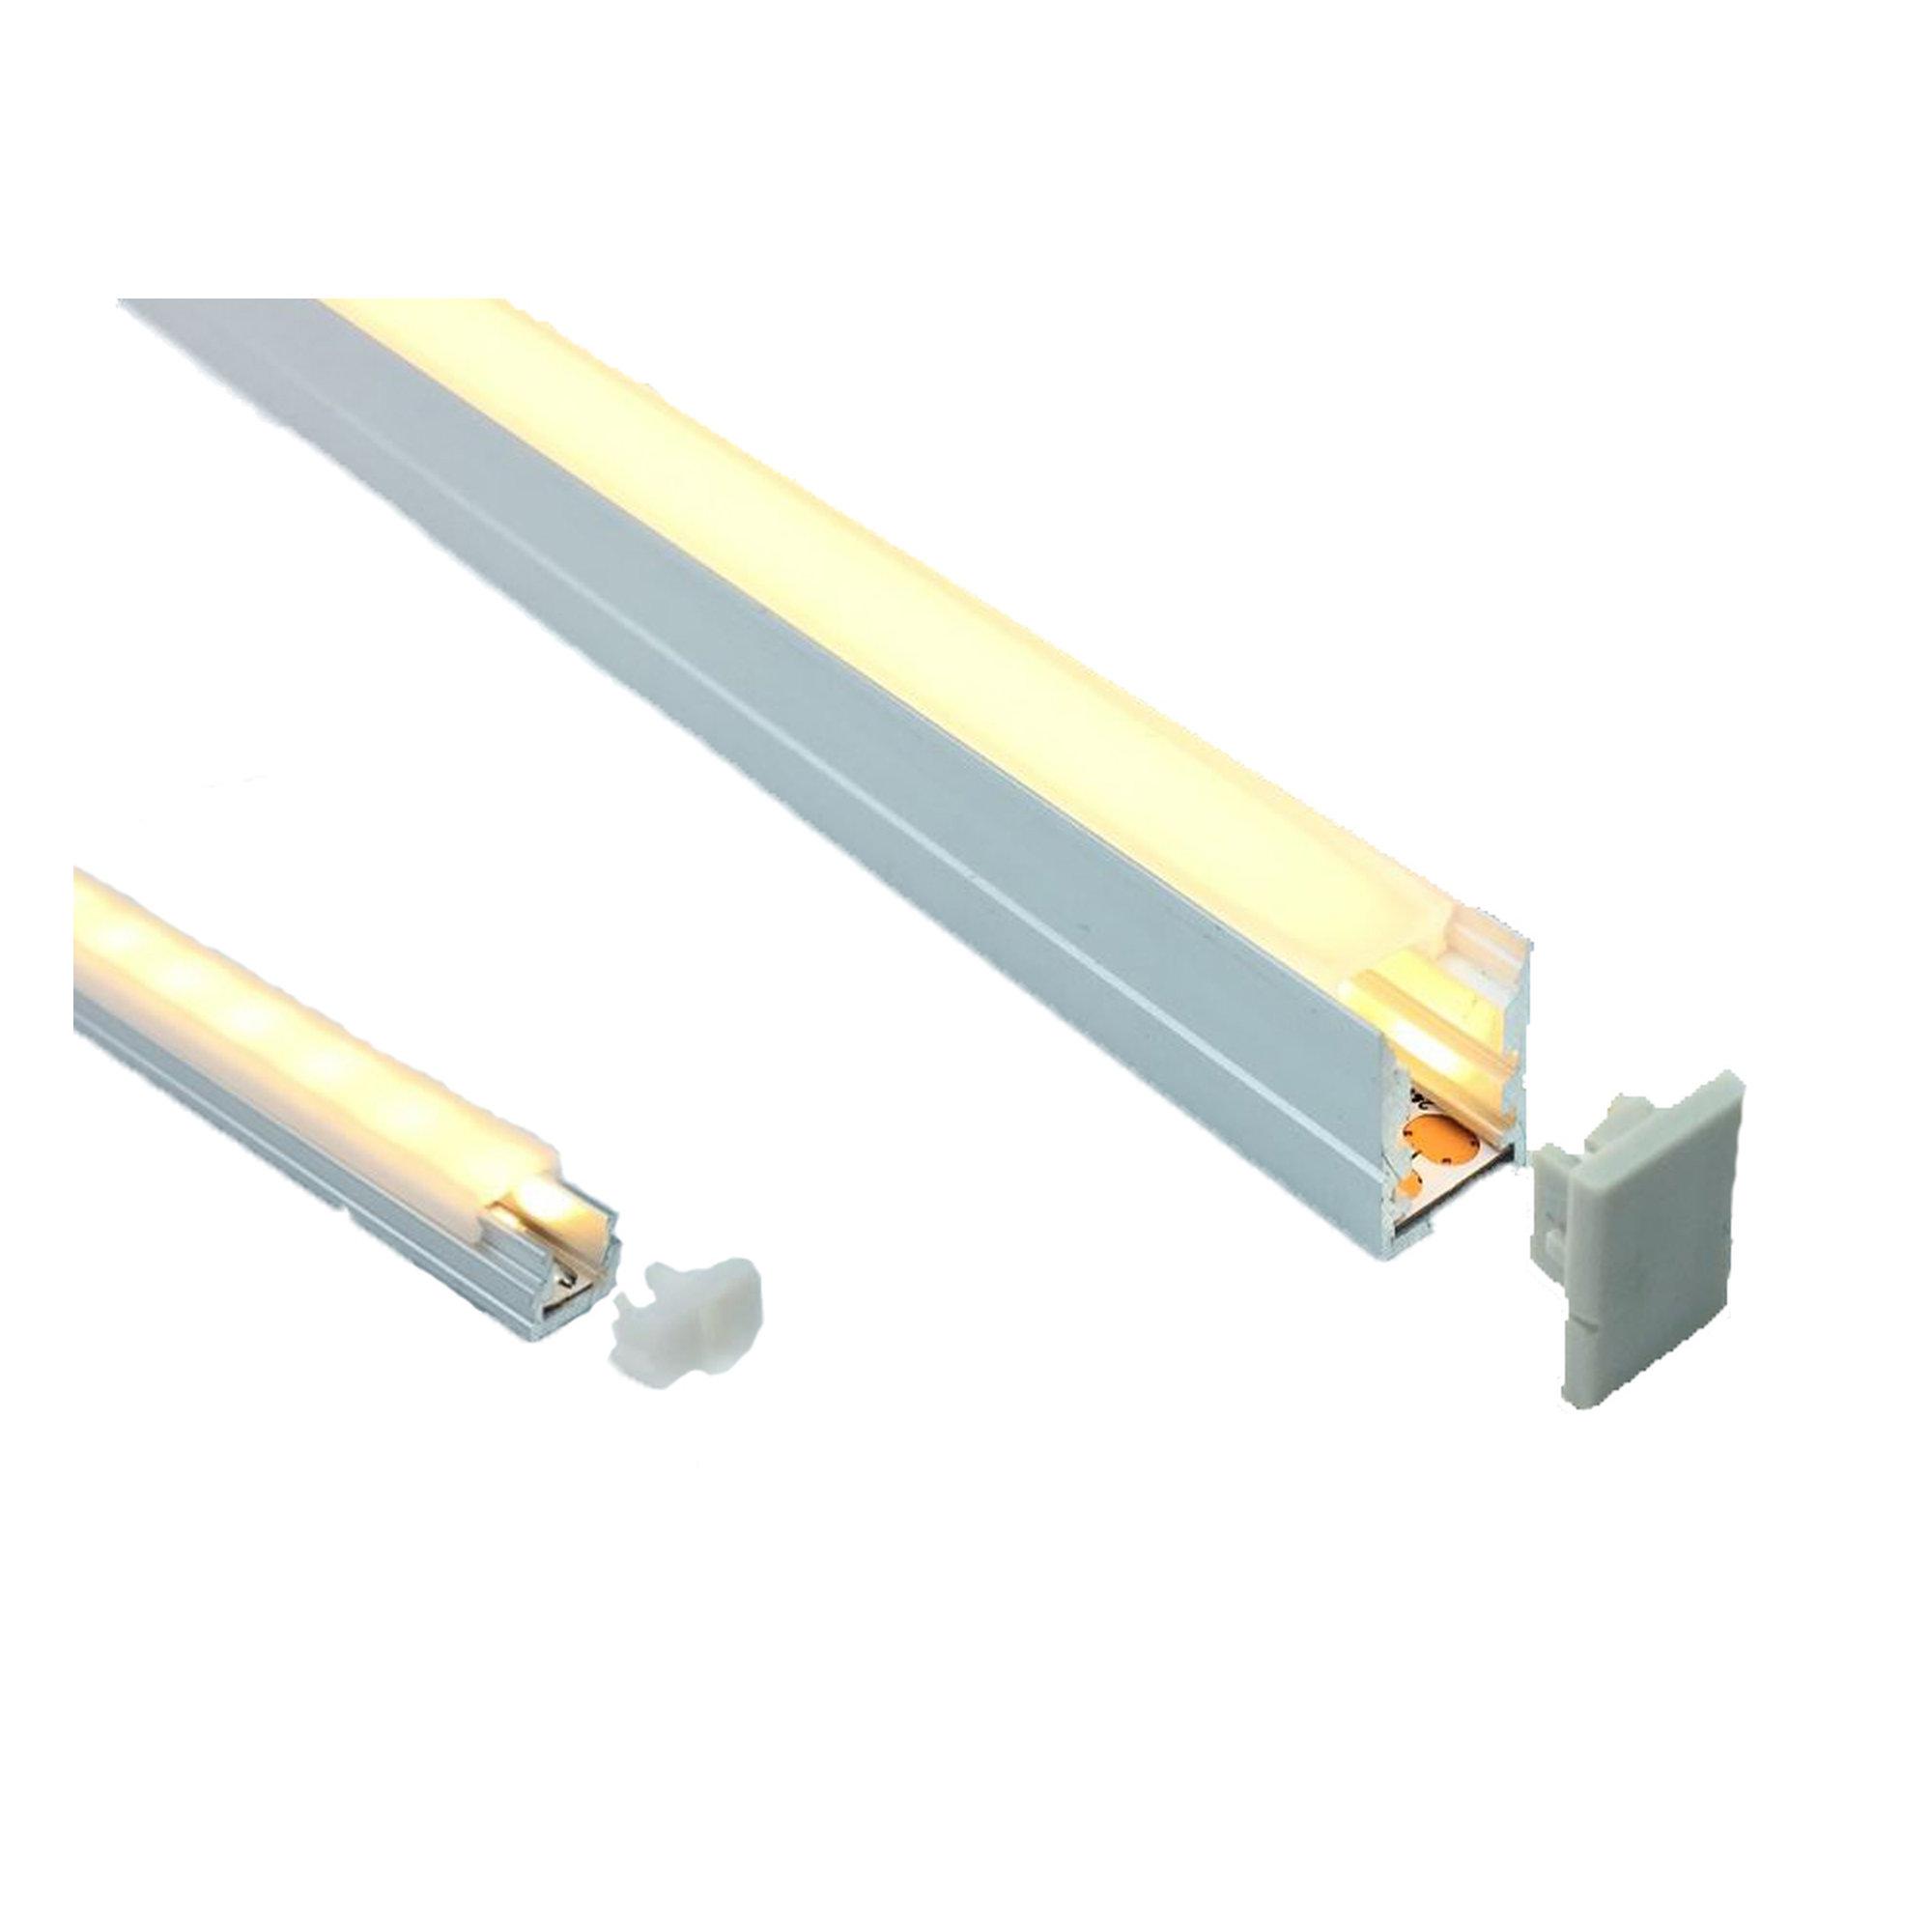 LED profile 18 x 15mm Opal Diffuser Trim